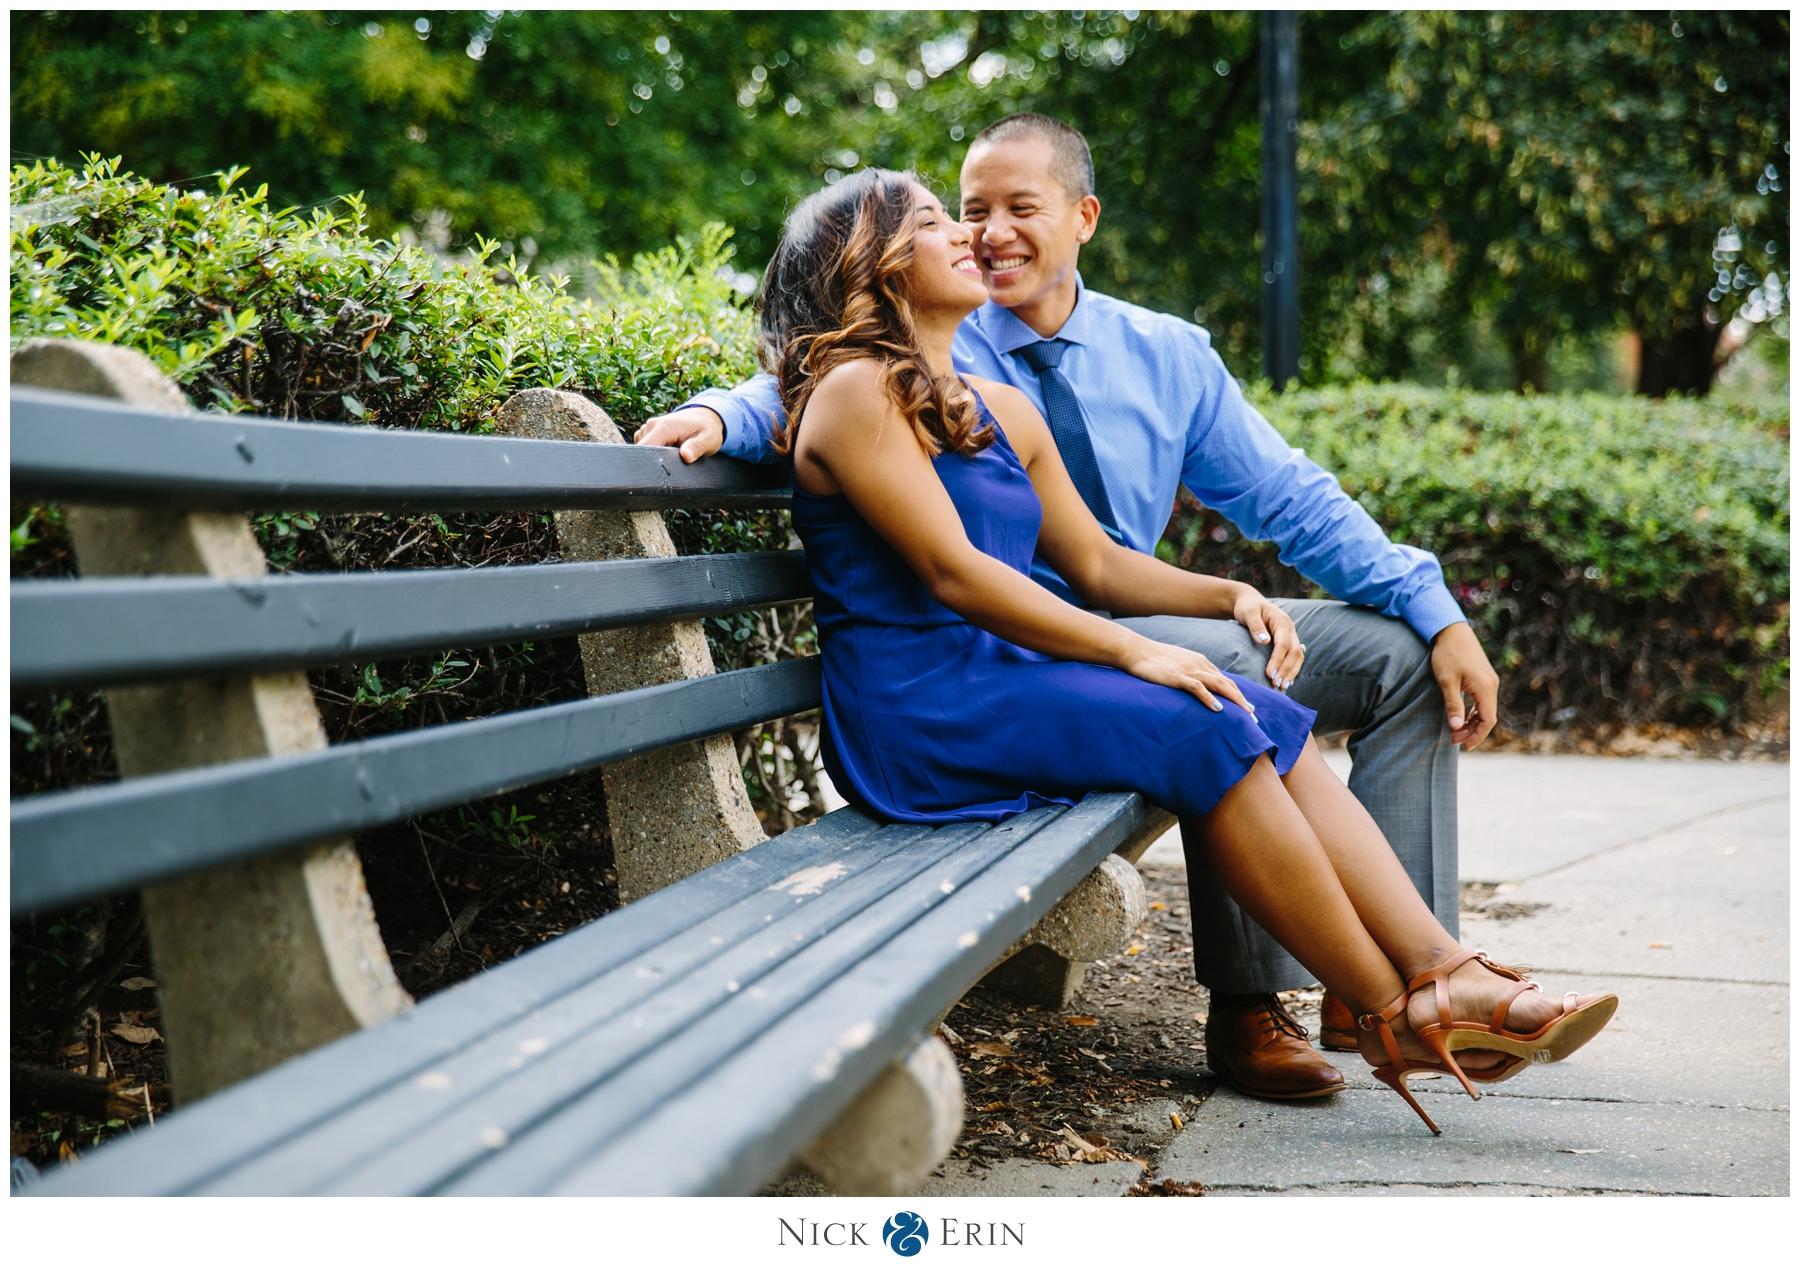 Donner_Photography_Washington DC Engagement Session_Jenny Mae & Vic_0022